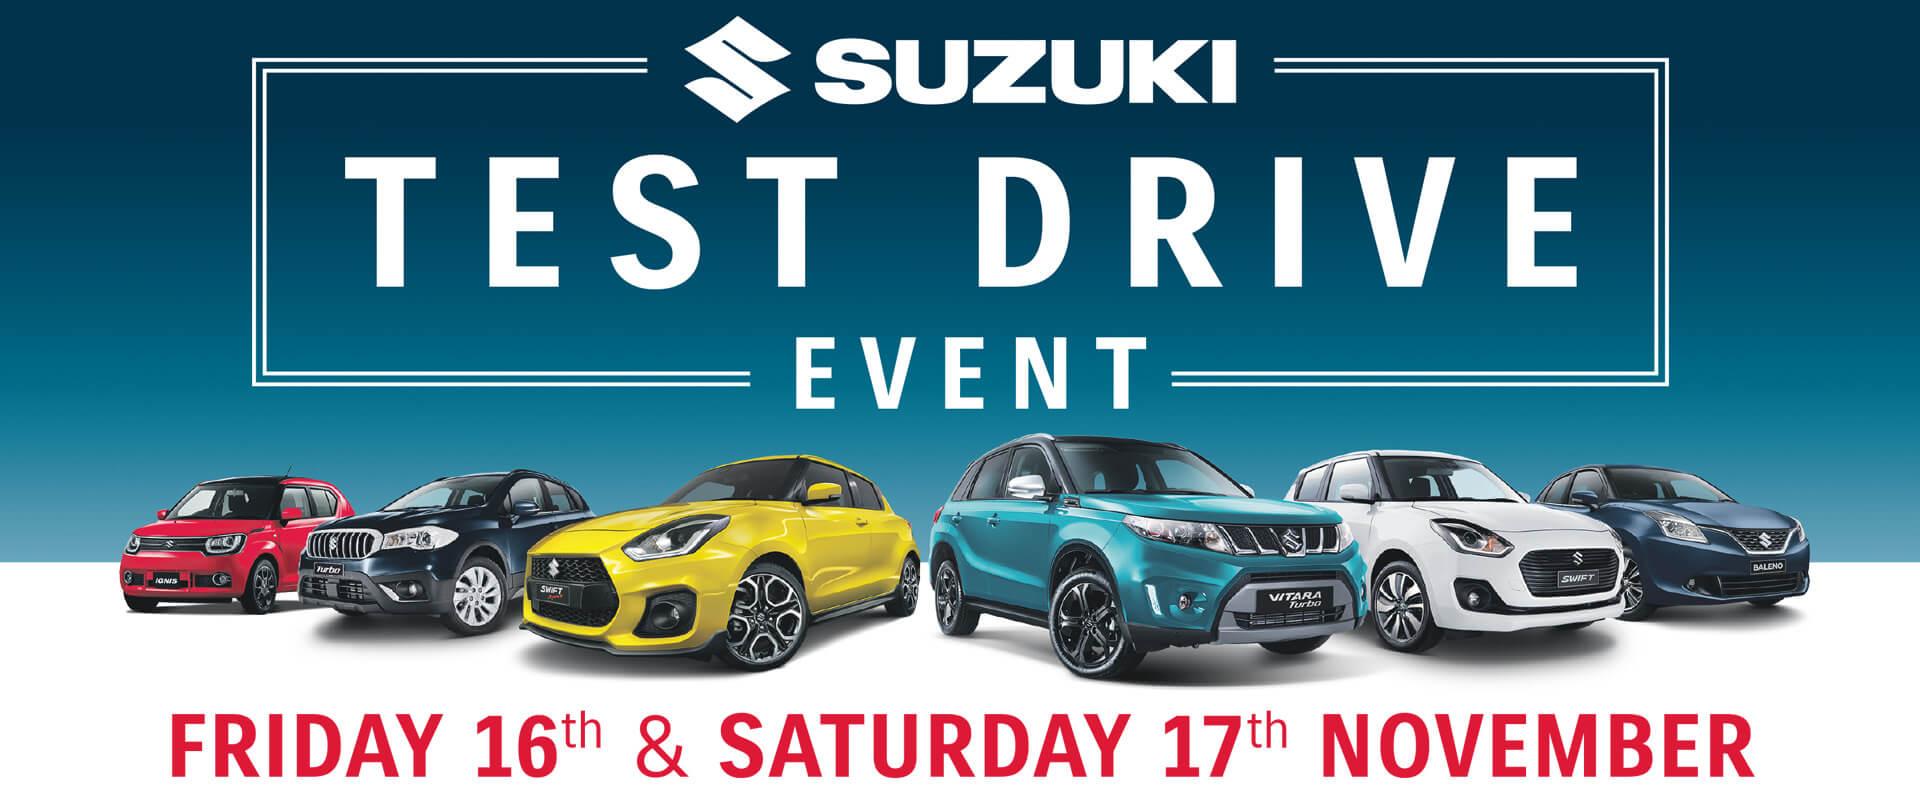 Suzuki Test Drive Event